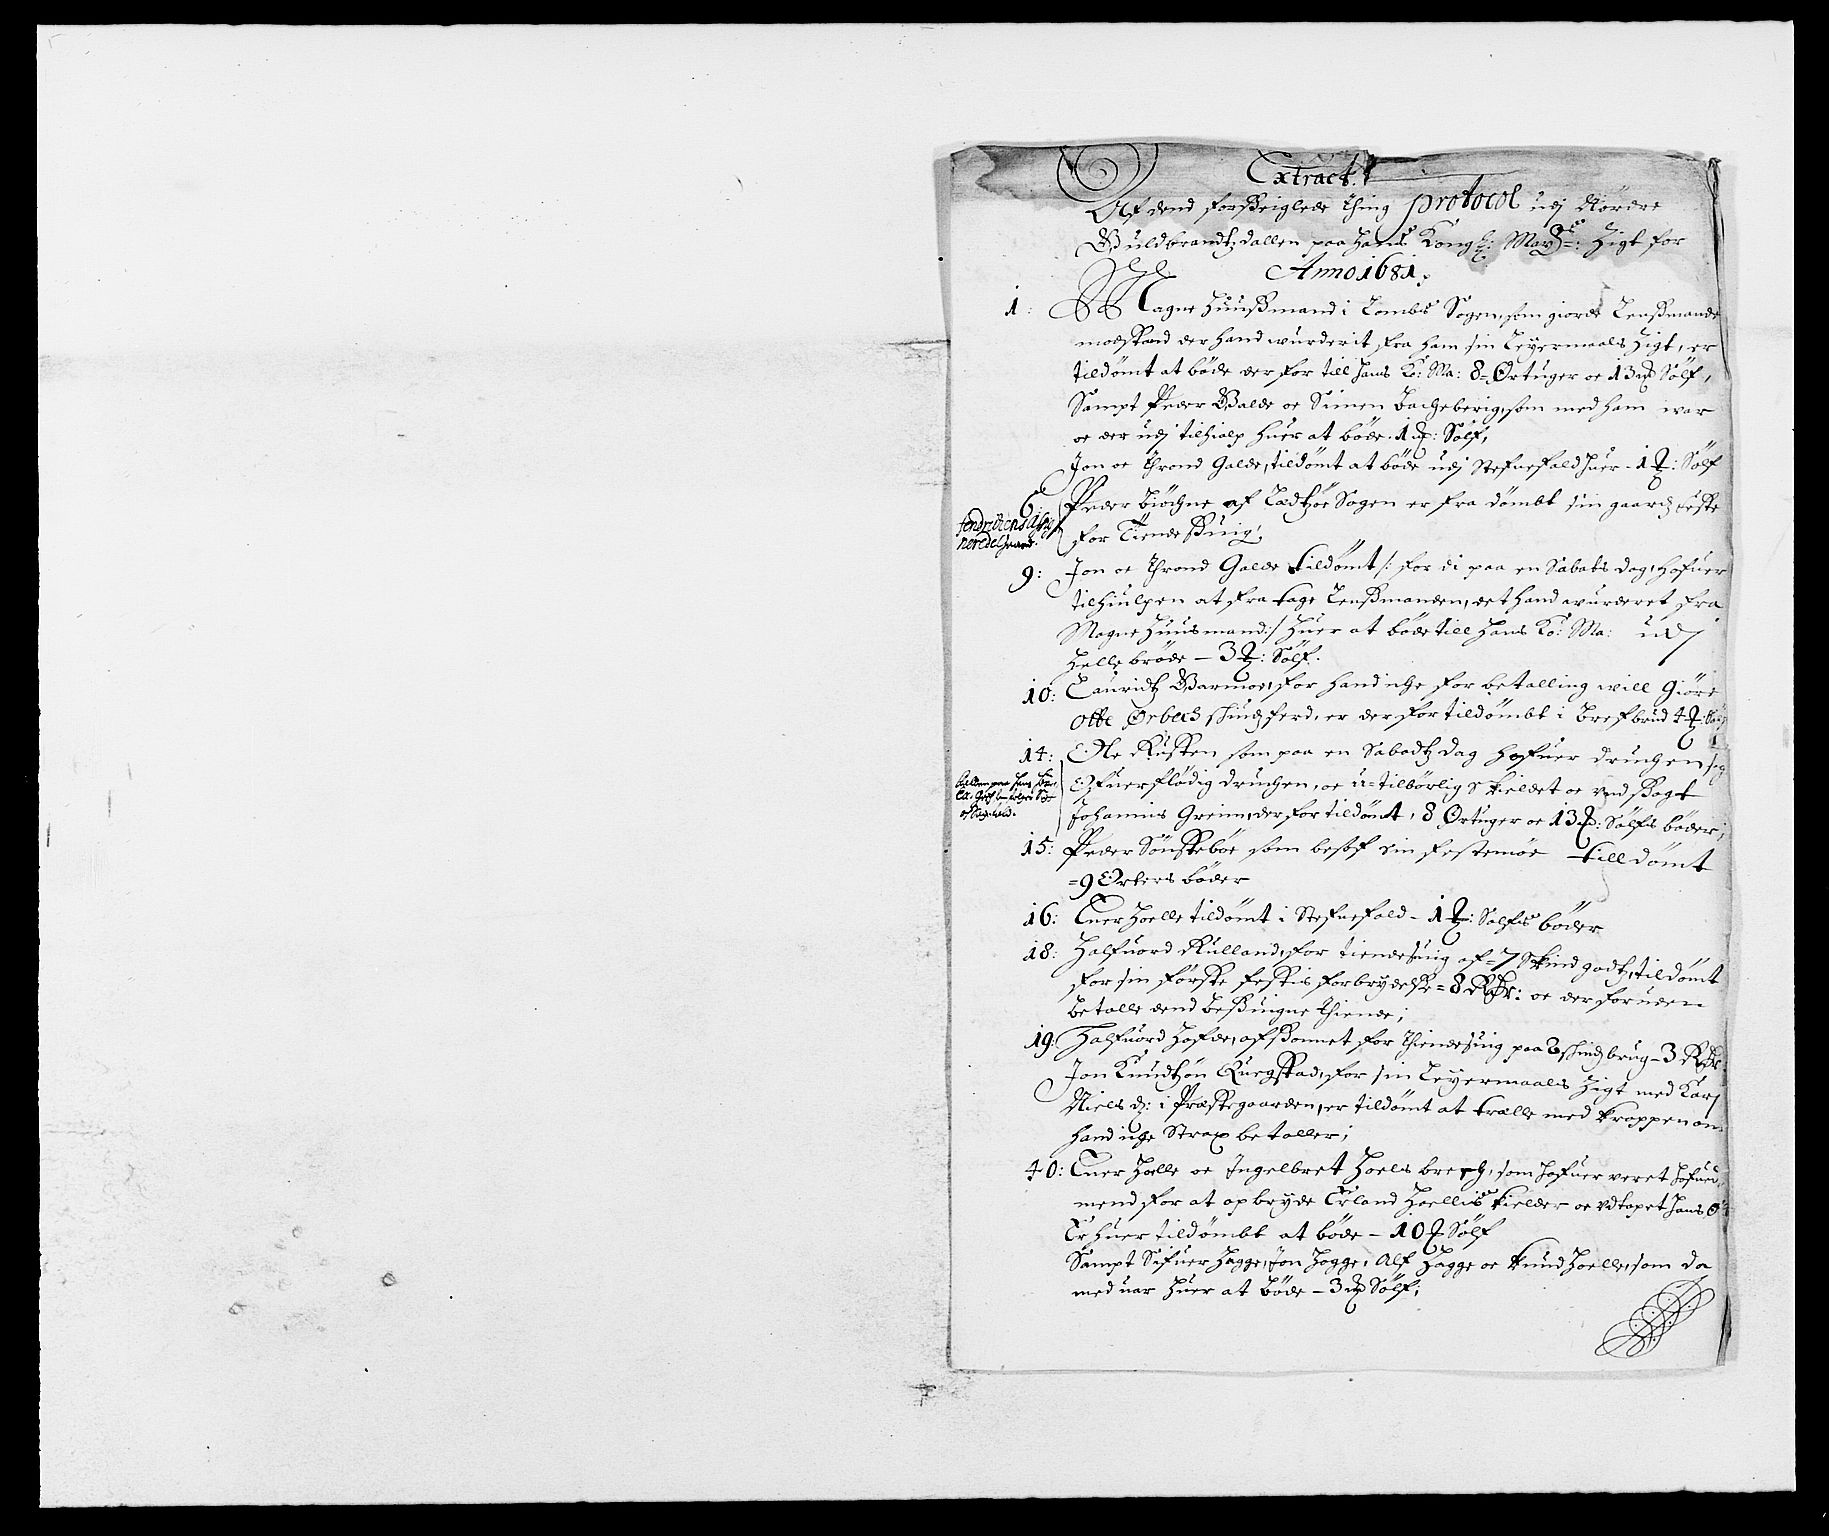 RA, Rentekammeret inntil 1814, Reviderte regnskaper, Fogderegnskap, R17/L1156: Fogderegnskap Gudbrandsdal, 1681, s. 152